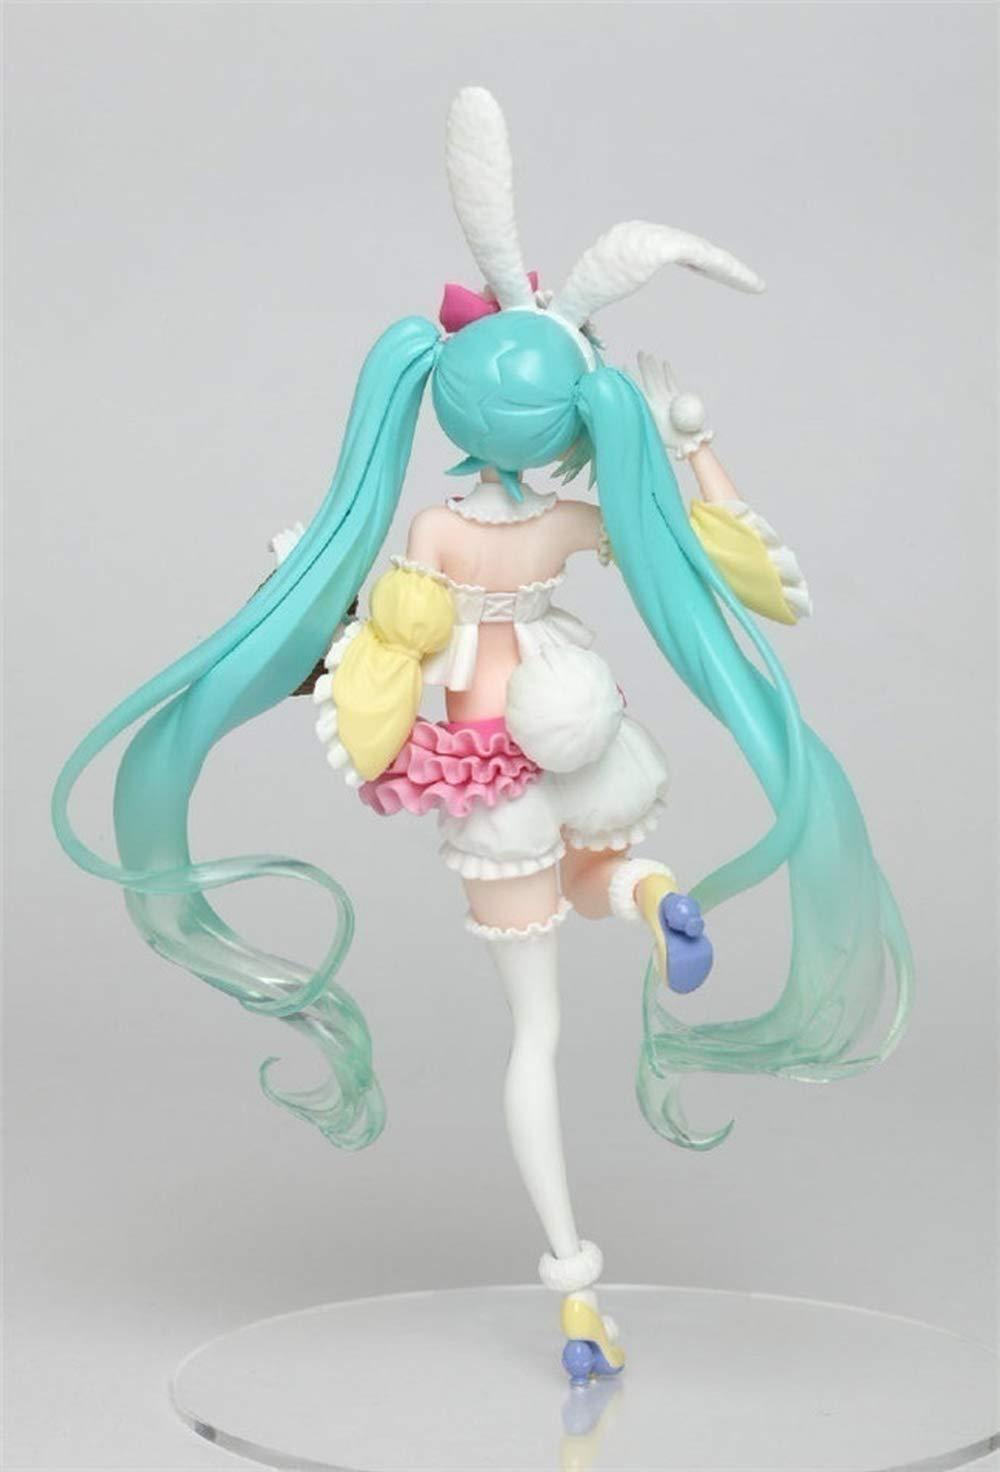 Taito Project Diva Hatsune Miku 2nd Season Spring Version 7 Figure